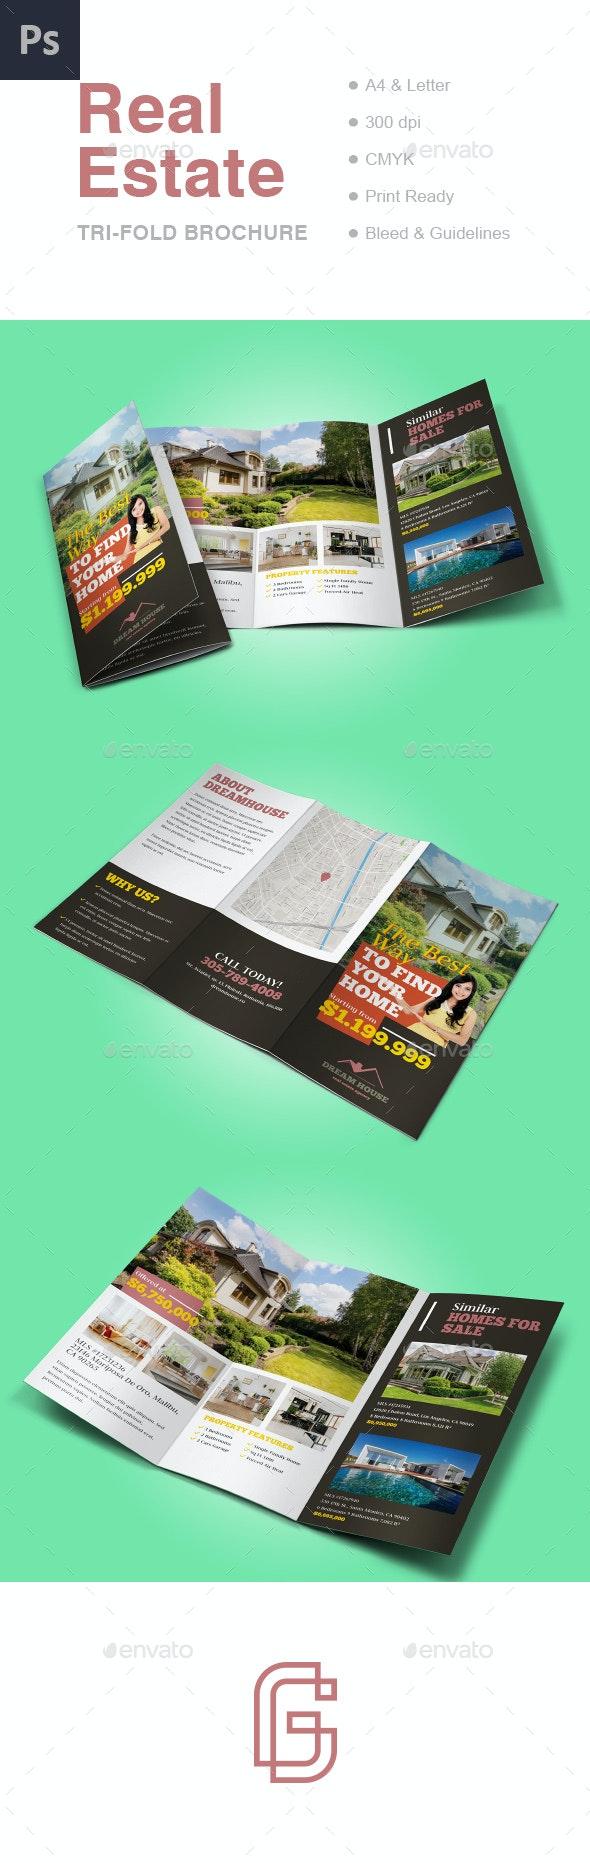 Real Estate Tri-fold Brochure Template - Informational Brochures